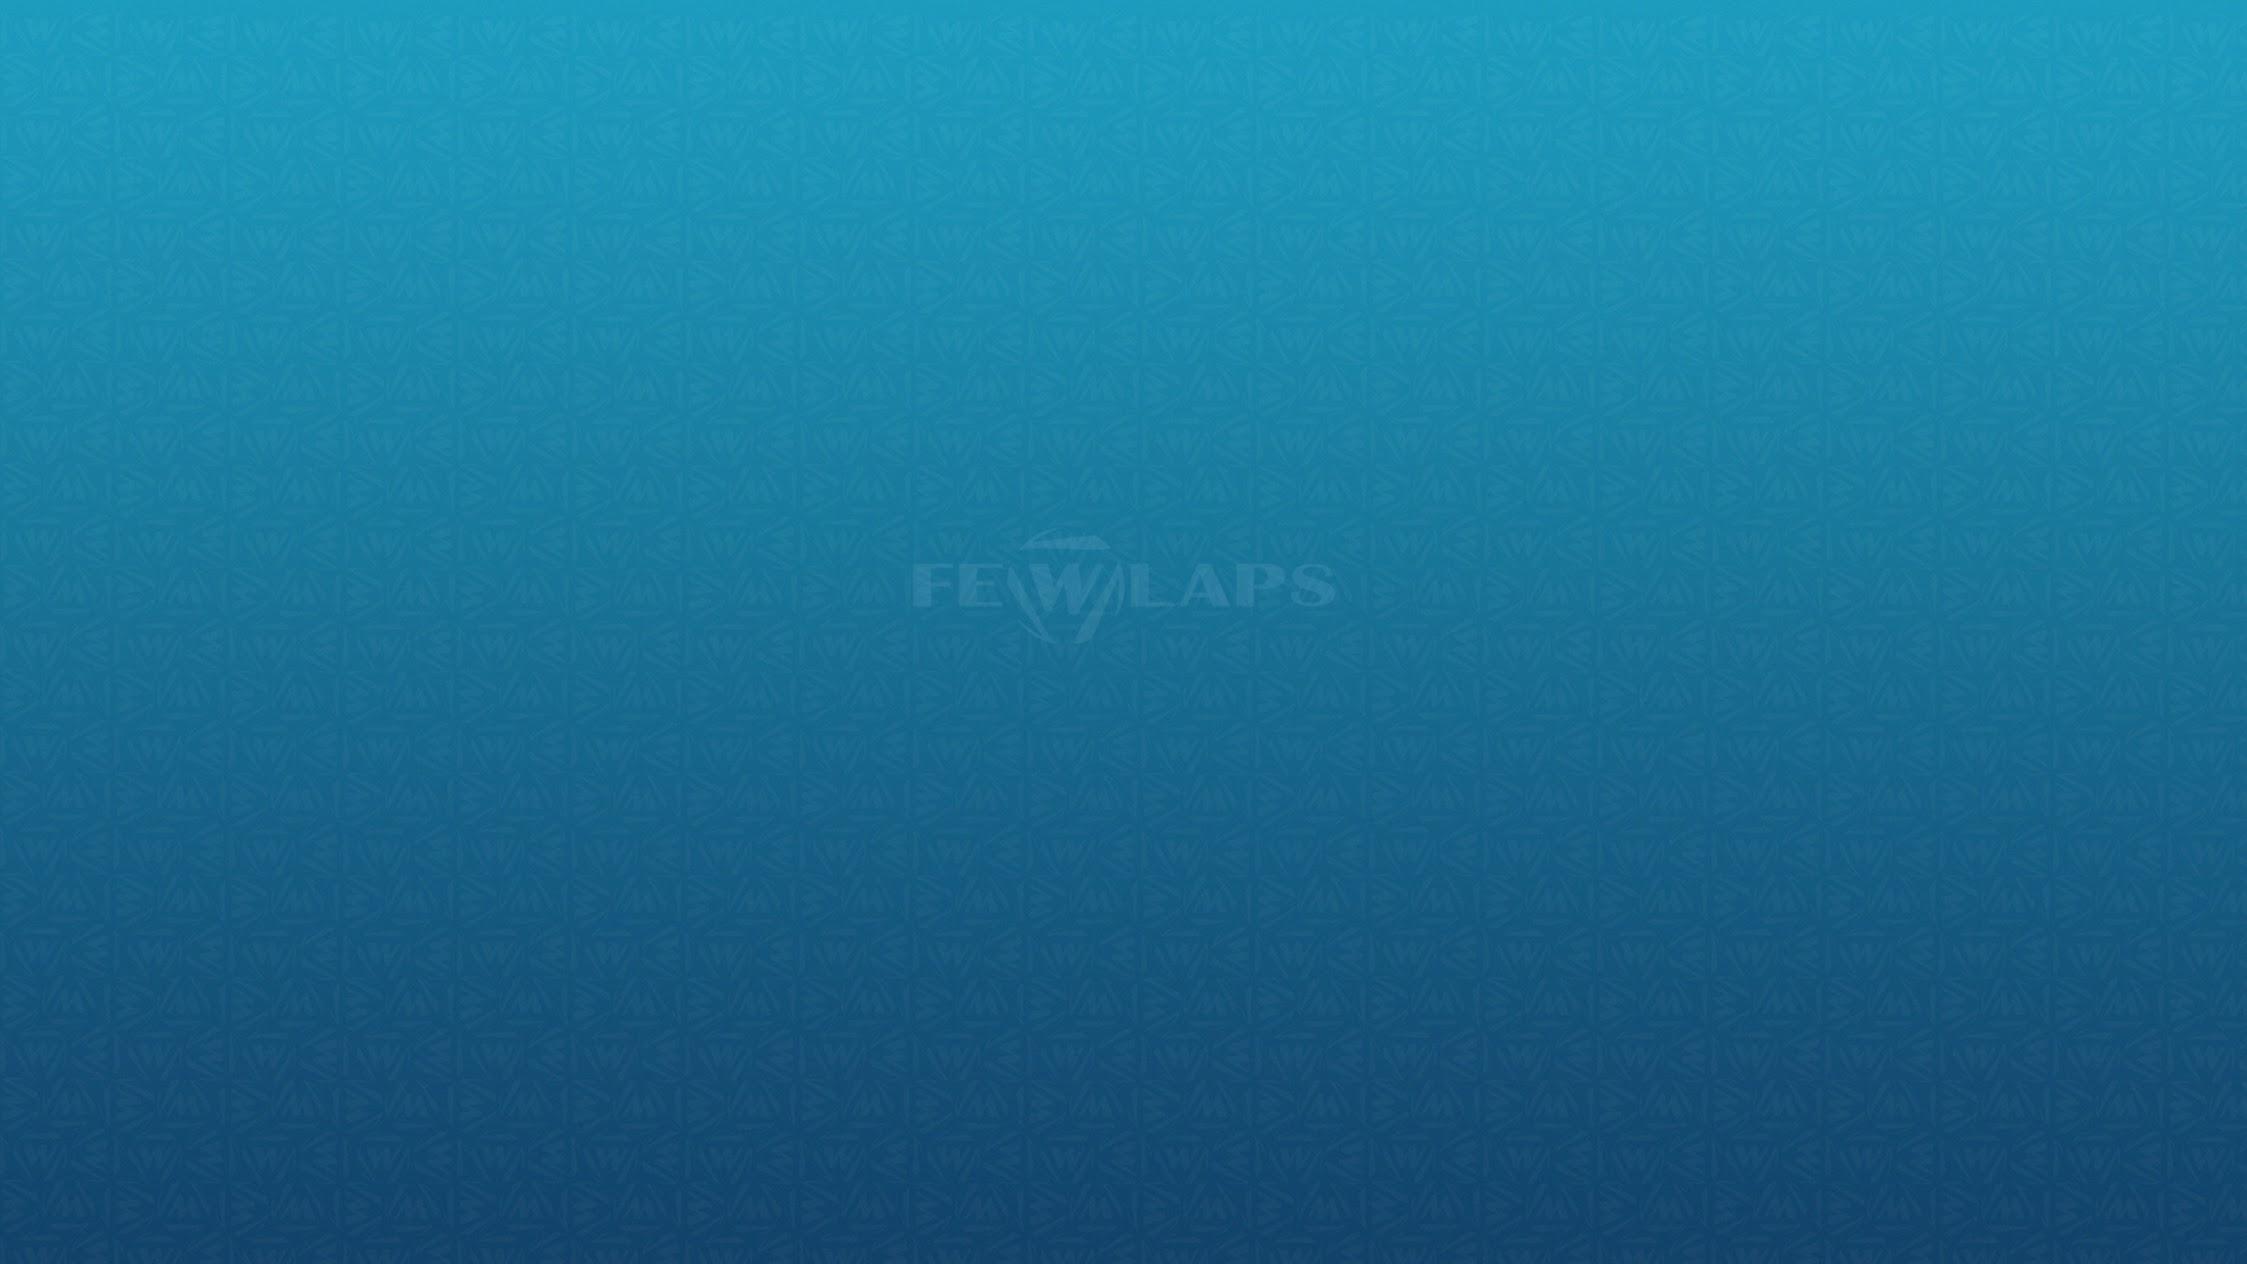 Fewlaps